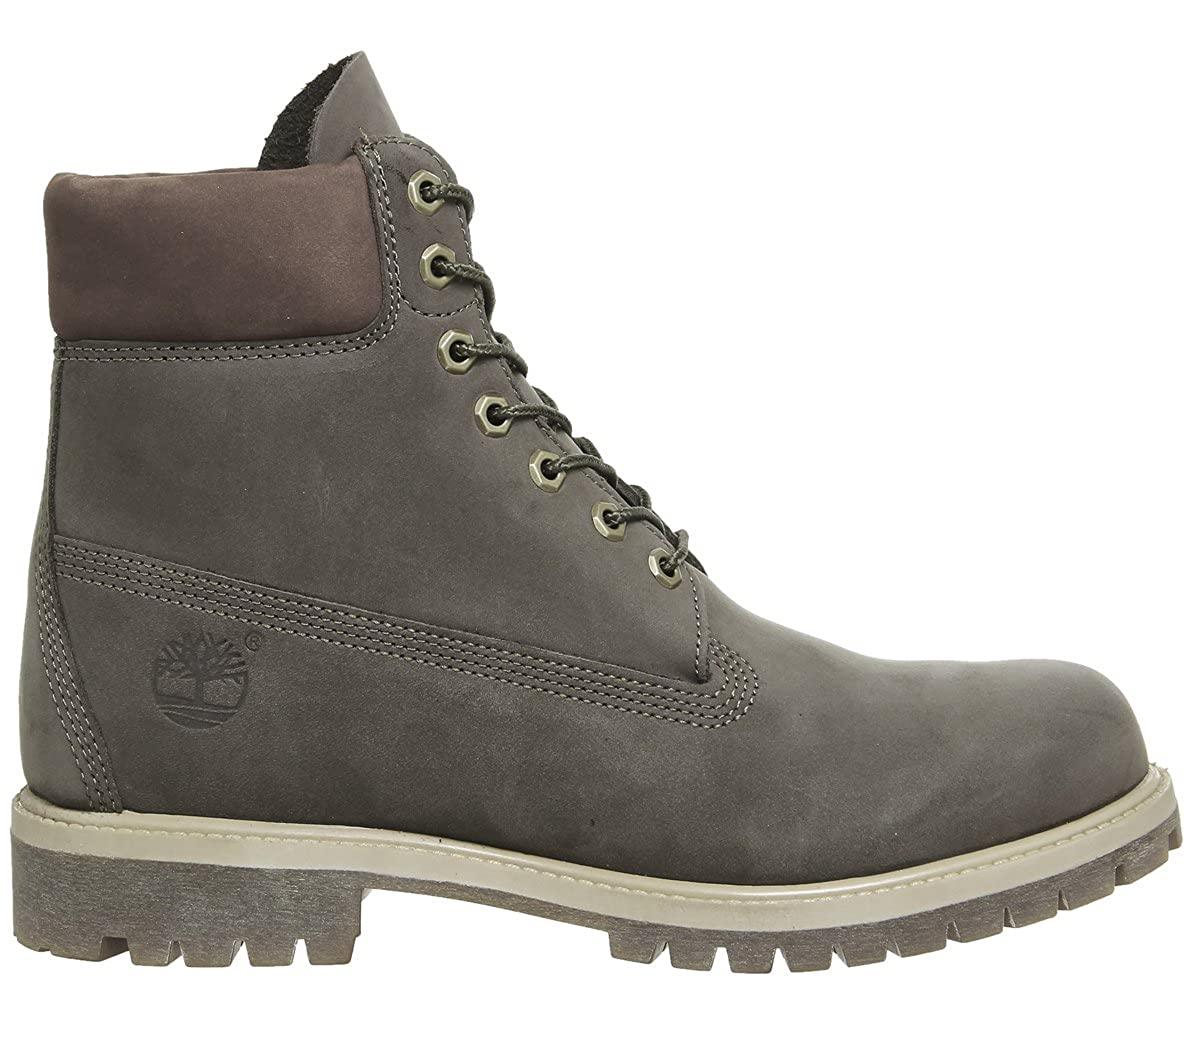 Timberland 6 Inch Premium FTB_10001 Herren Stiefel B073PPRWQH  | Neues Produkt